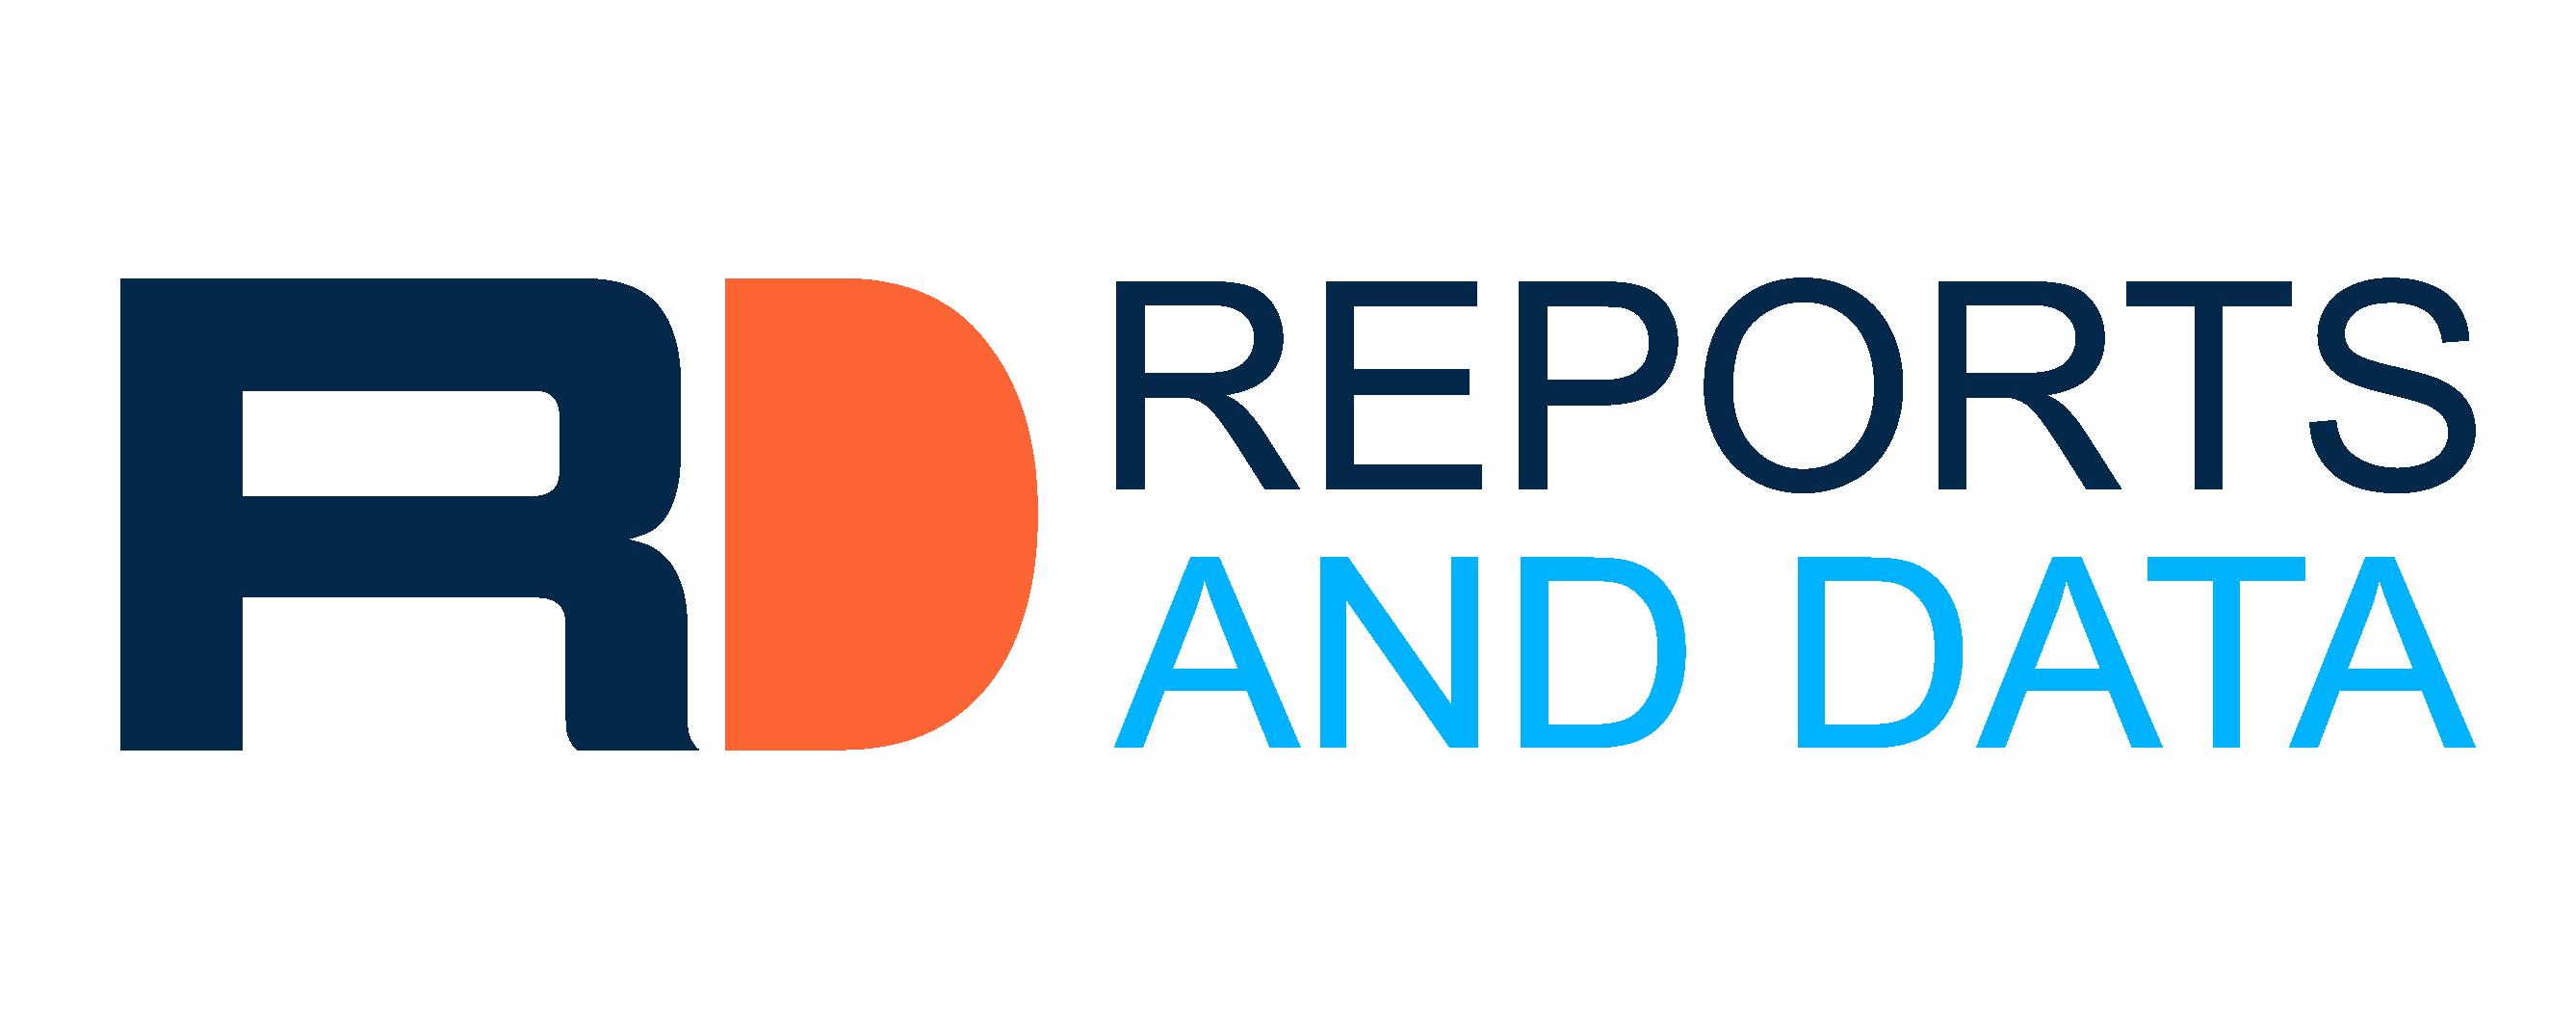 Global Iodine Market in-Depth and Comprehensive Analysis 2019-2026: Top Vendors- ISE Chemicals Corporation, SQM, Iofina PLC, Algorta Norte Sa, Nippoh Chemicals Co. Ltd.